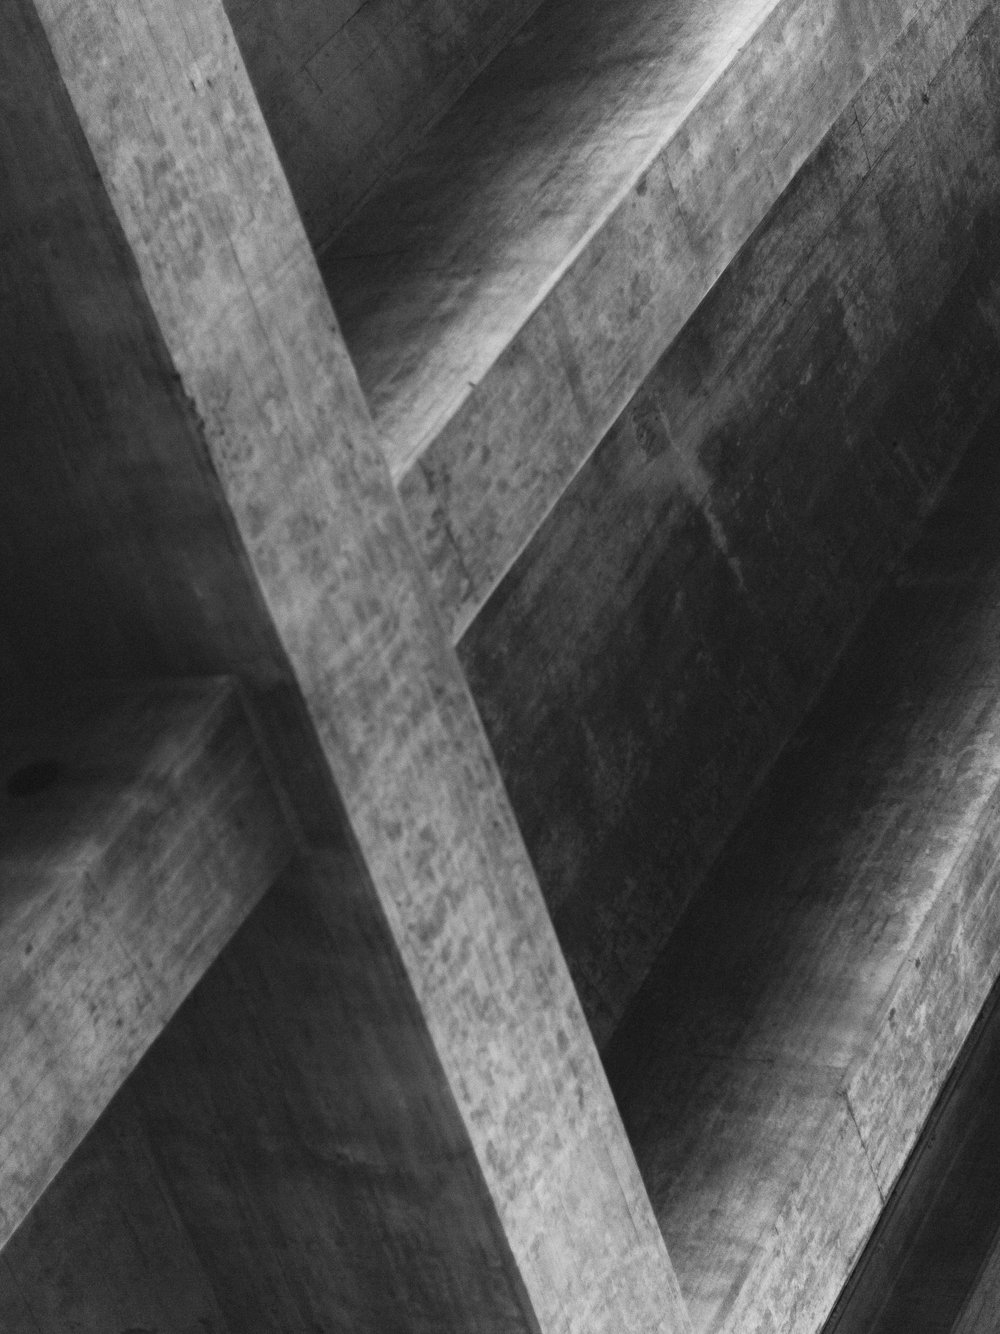 TWP-KarlAntonBjorkman--10.jpg